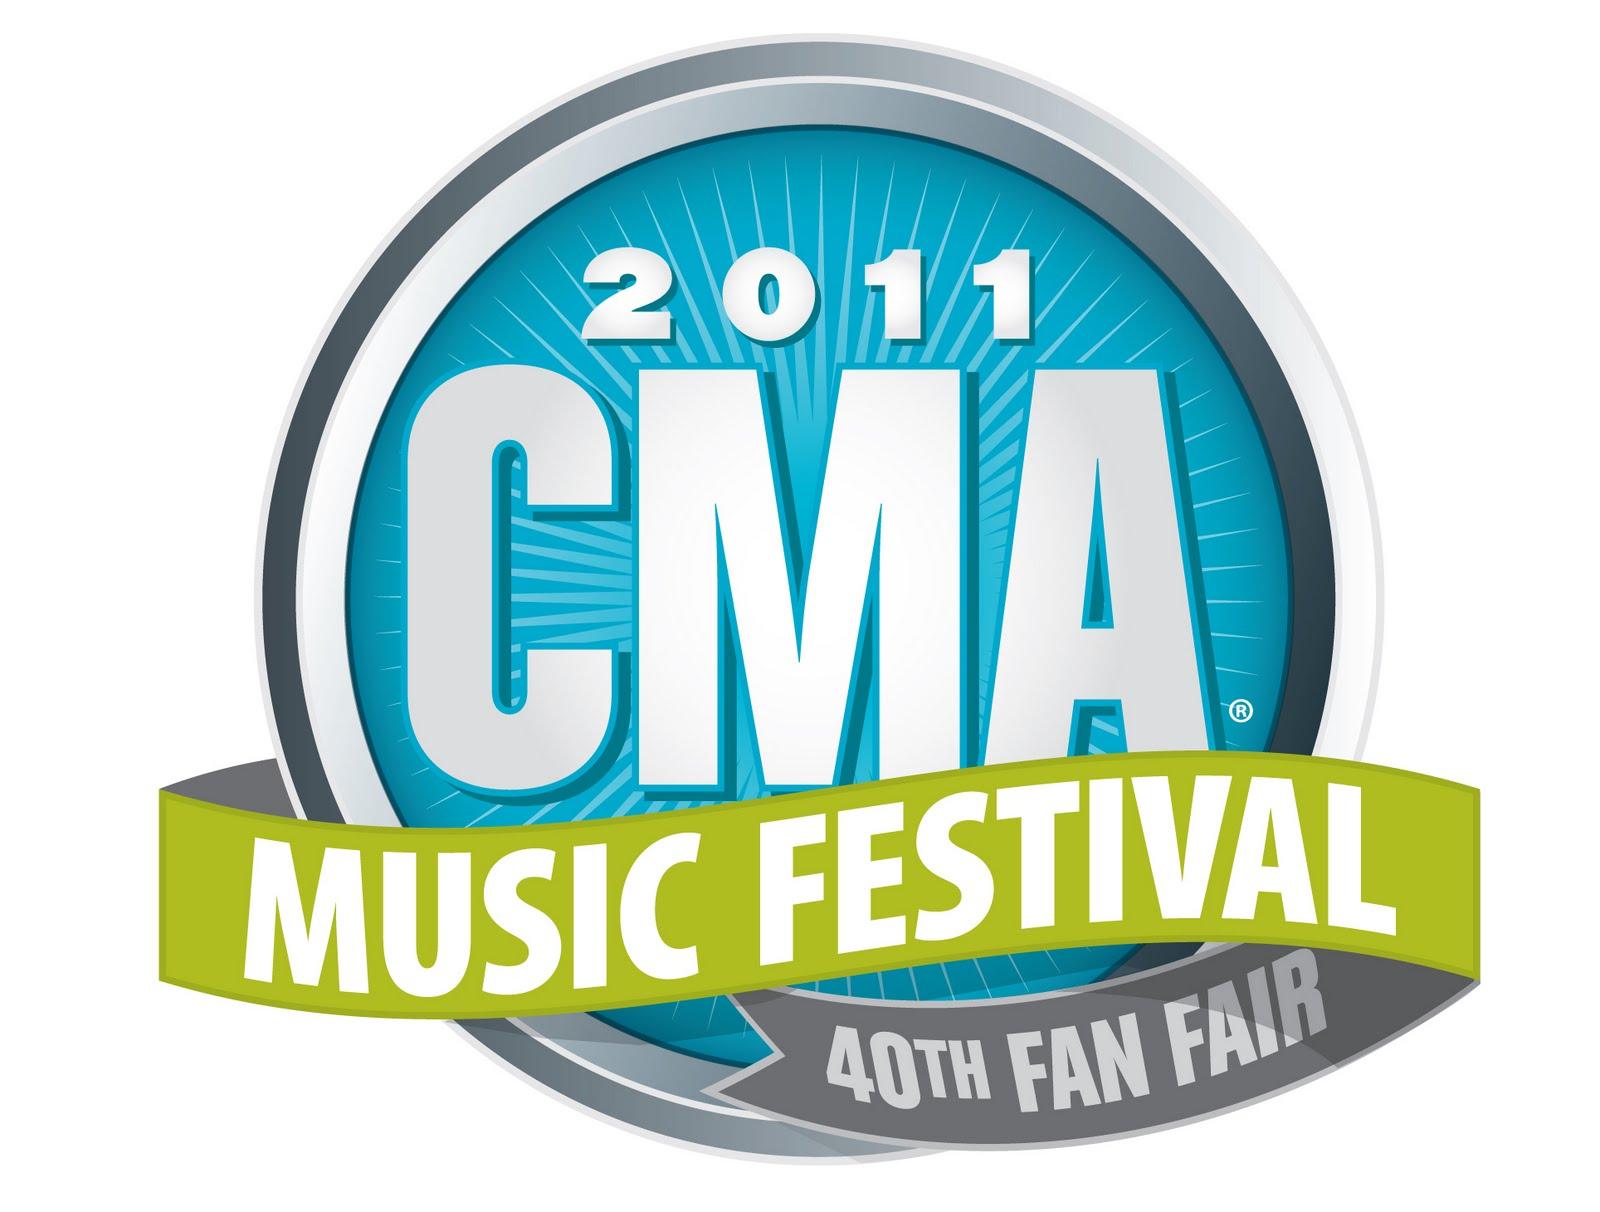 http://4.bp.blogspot.com/-F0Uads6YTwM/TfFOd2sCwkI/AAAAAAAAAAM/Ze1t_ISFIzA/s1600/2011_cma_music_festival_logo_nodate.jpg